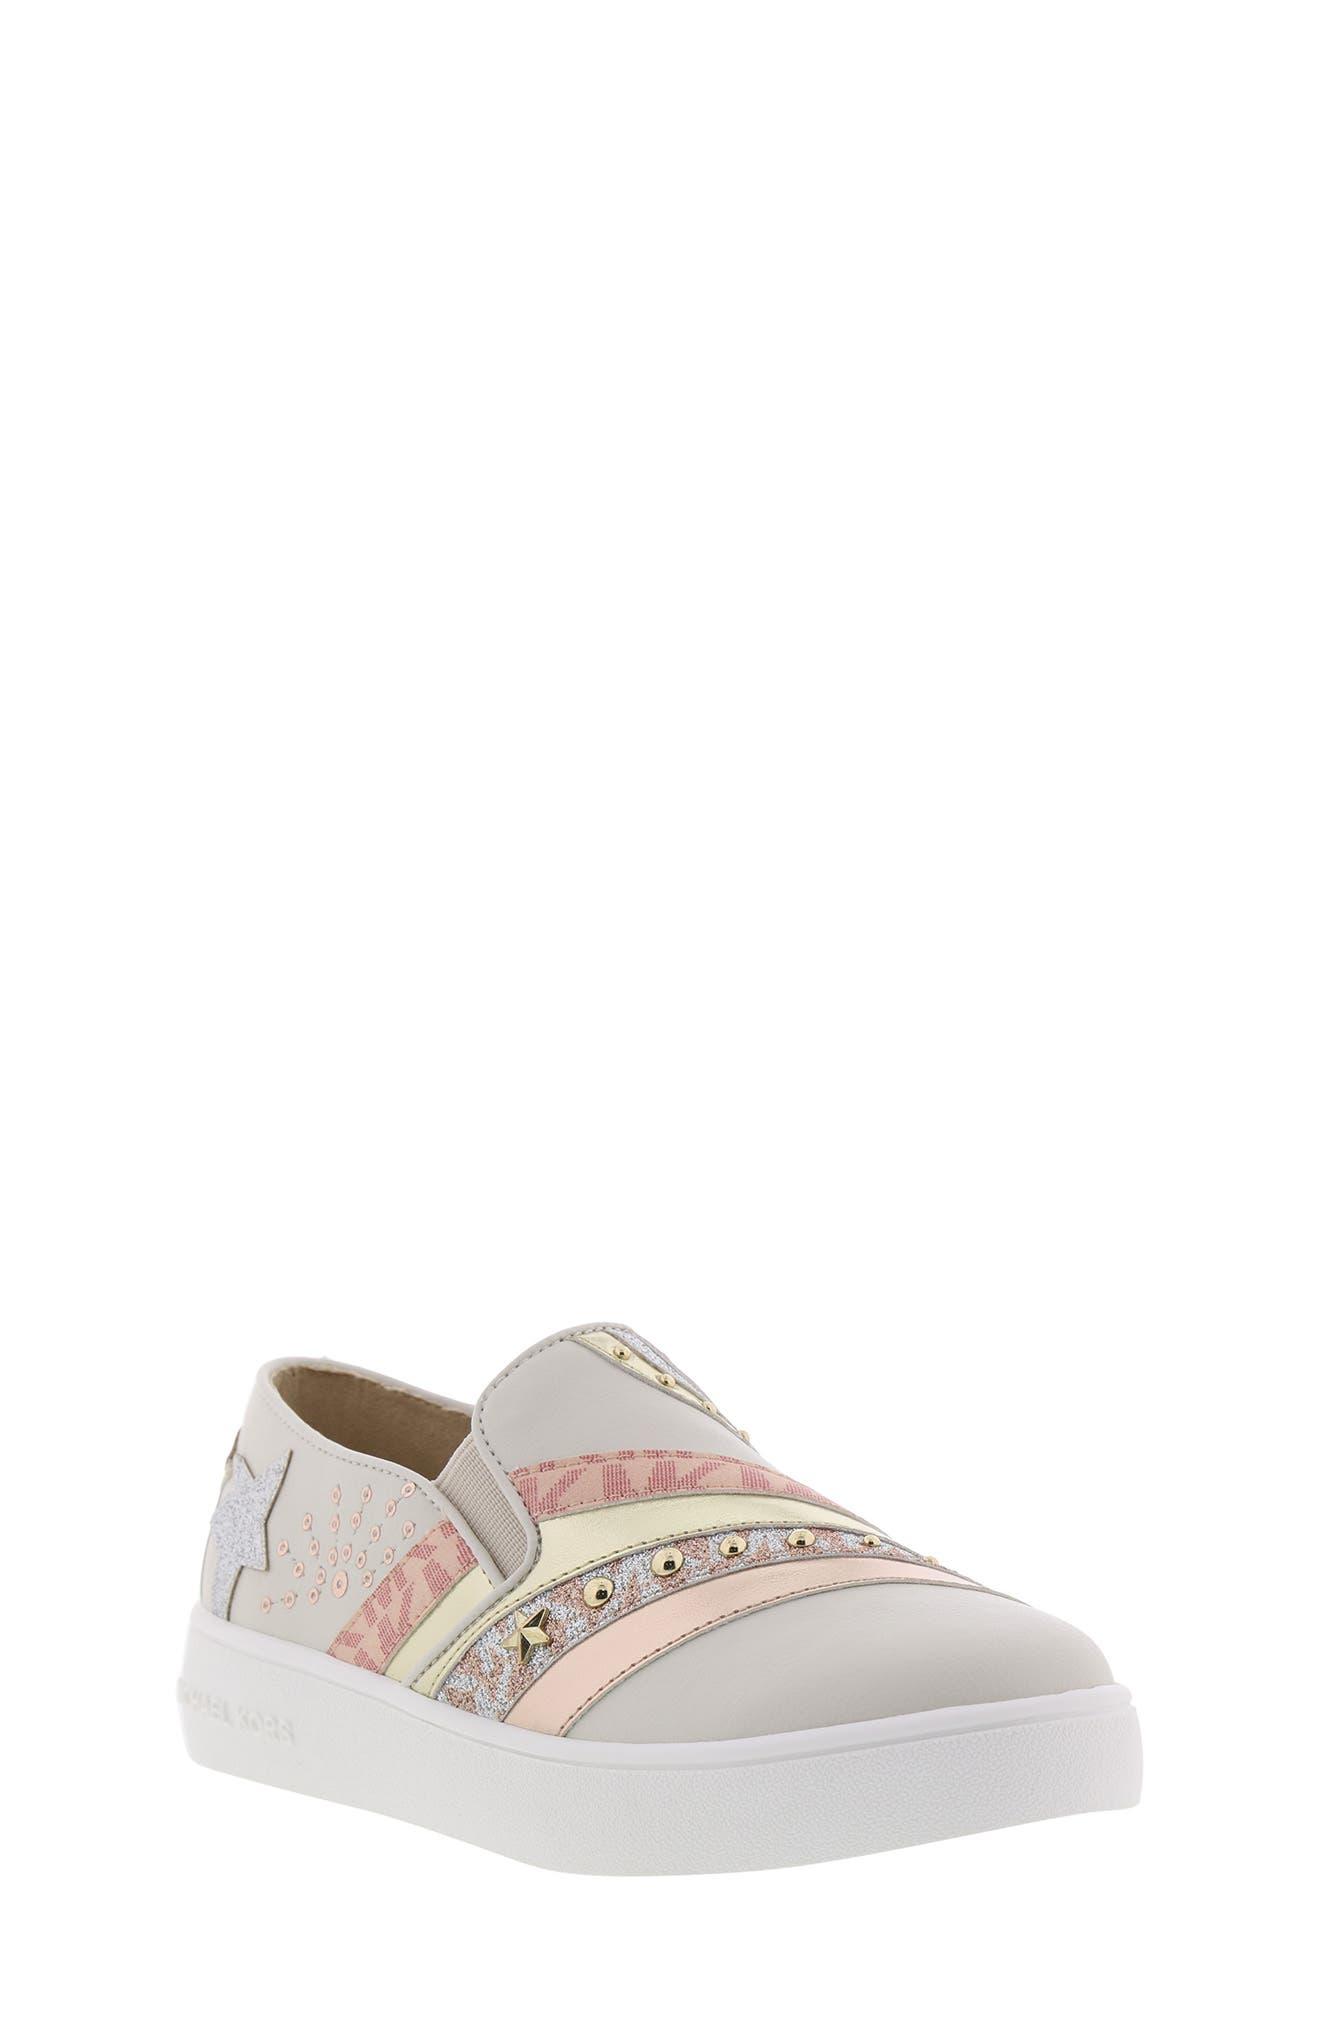 Jem Starlight Slip-On Sneaker, Main, color, VANILLA